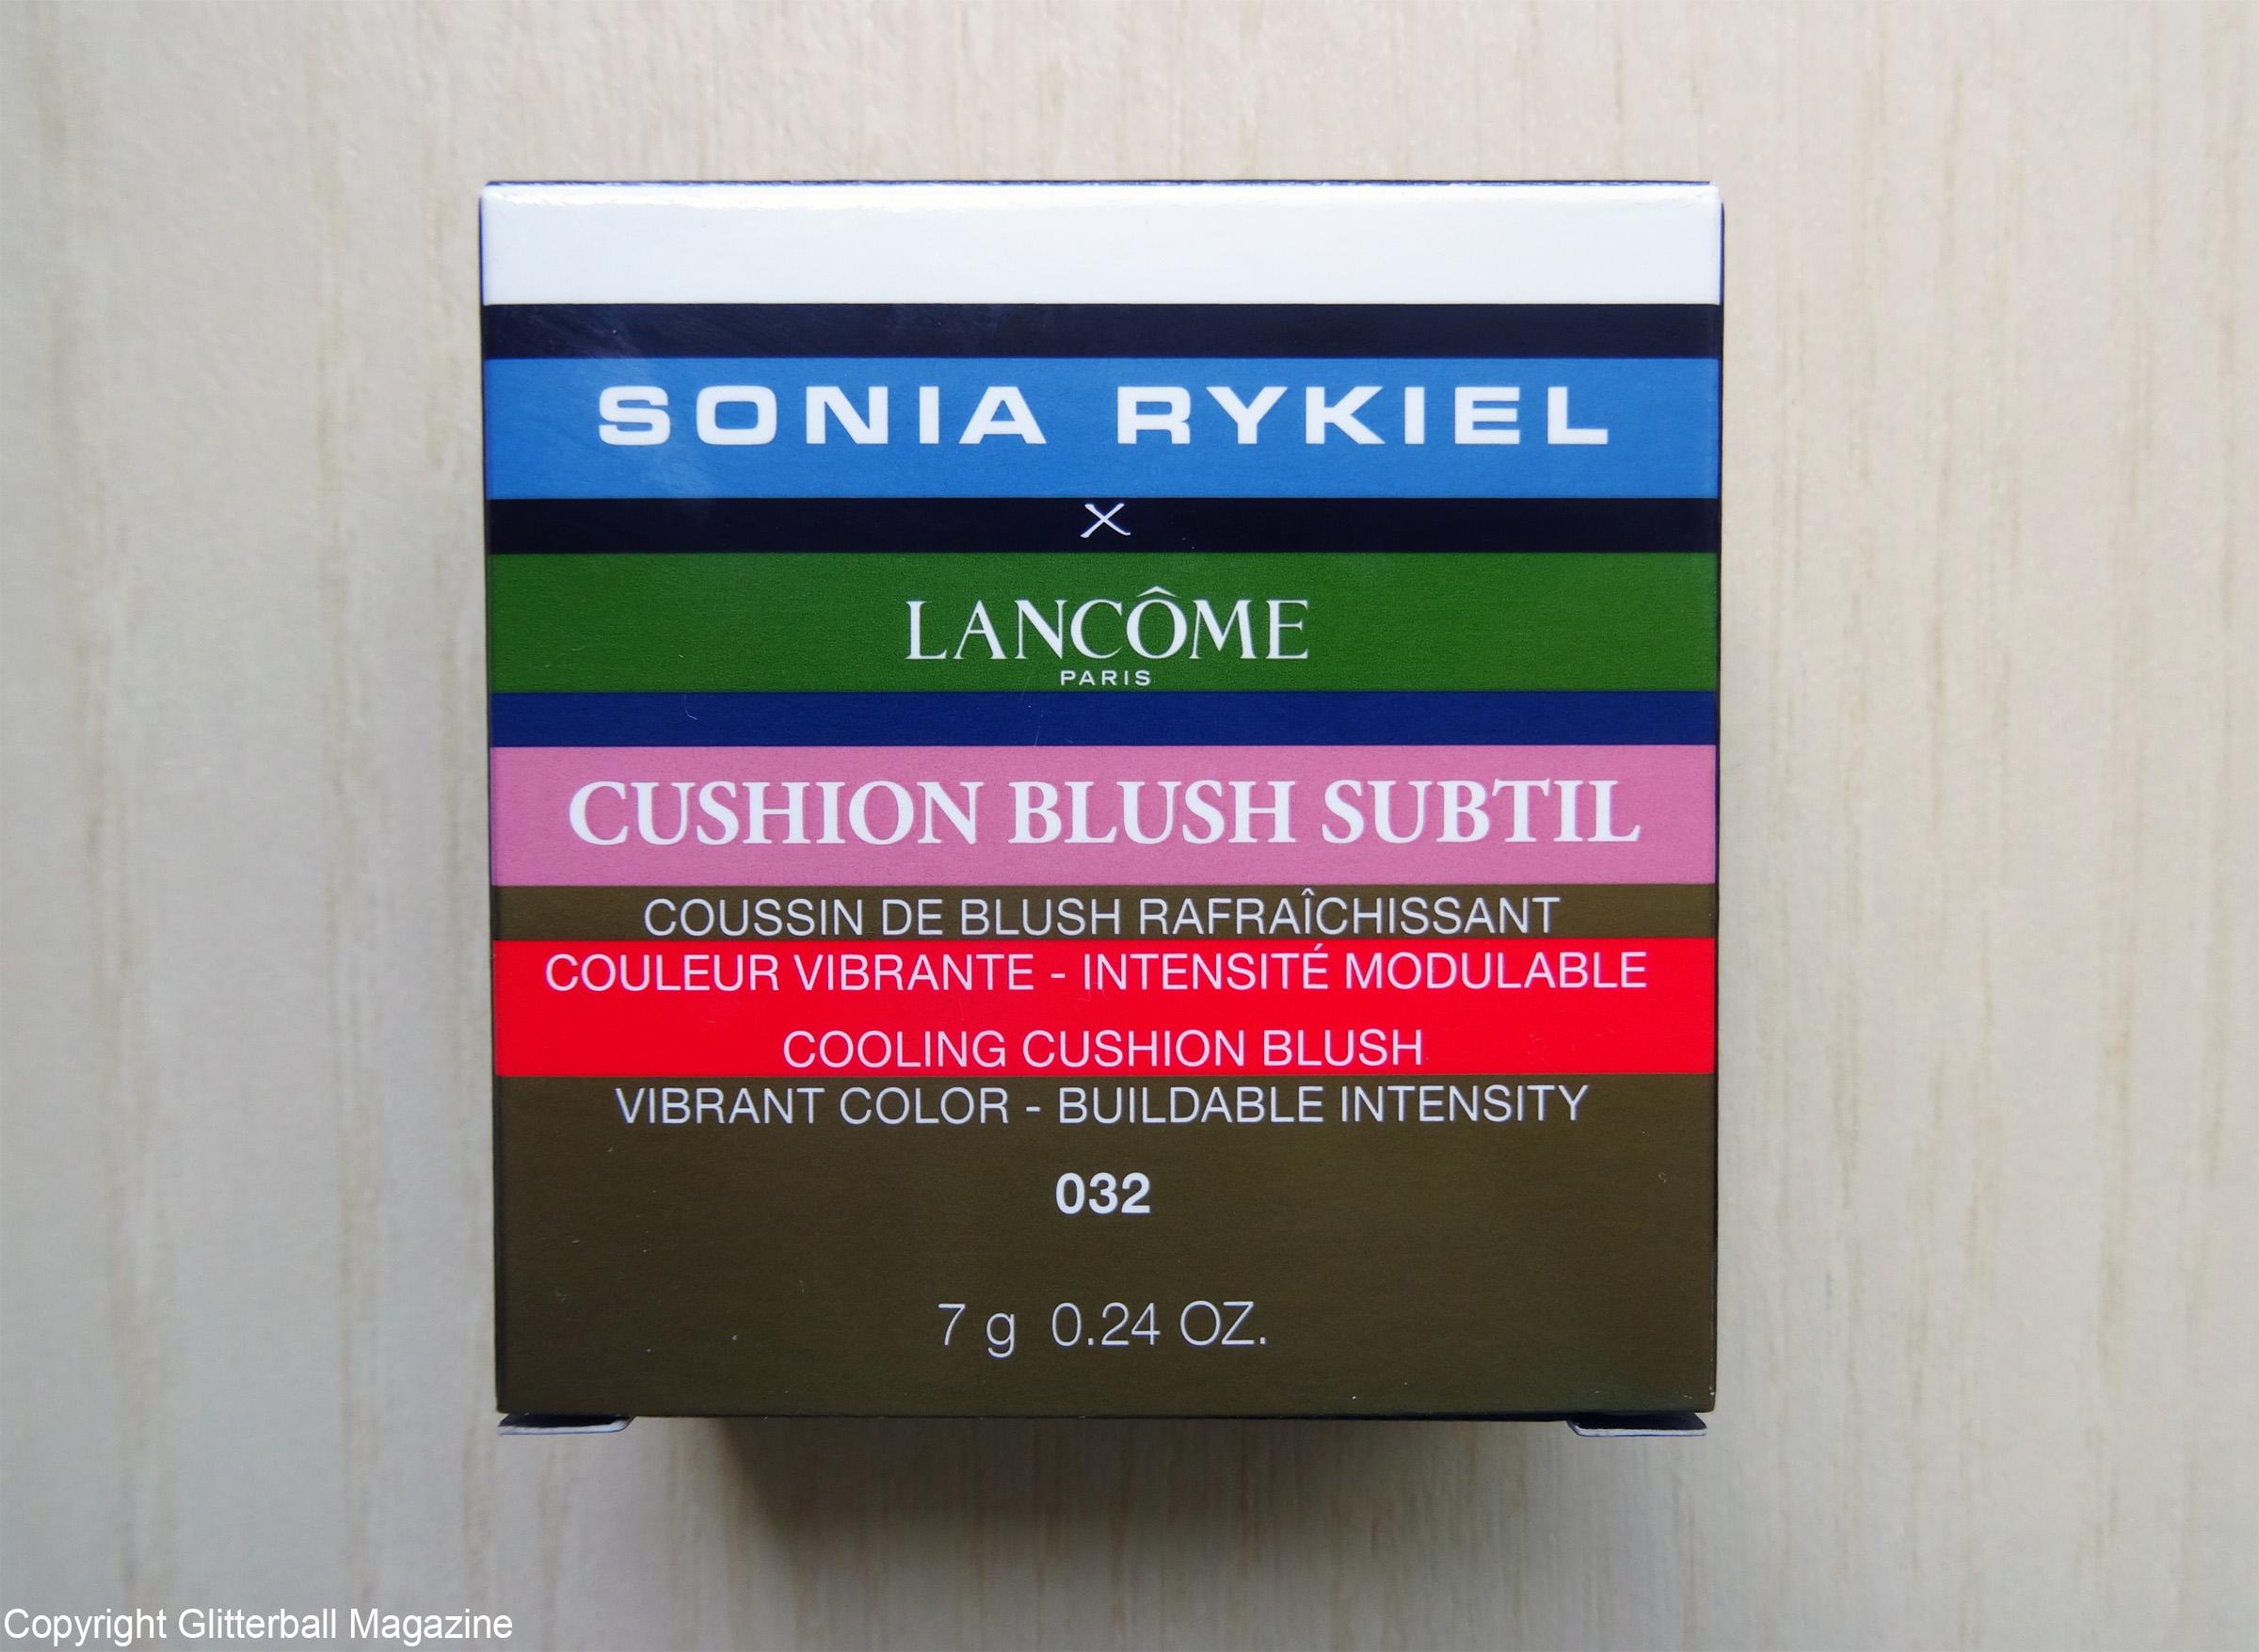 sonia-rykiel-x-lancome-1